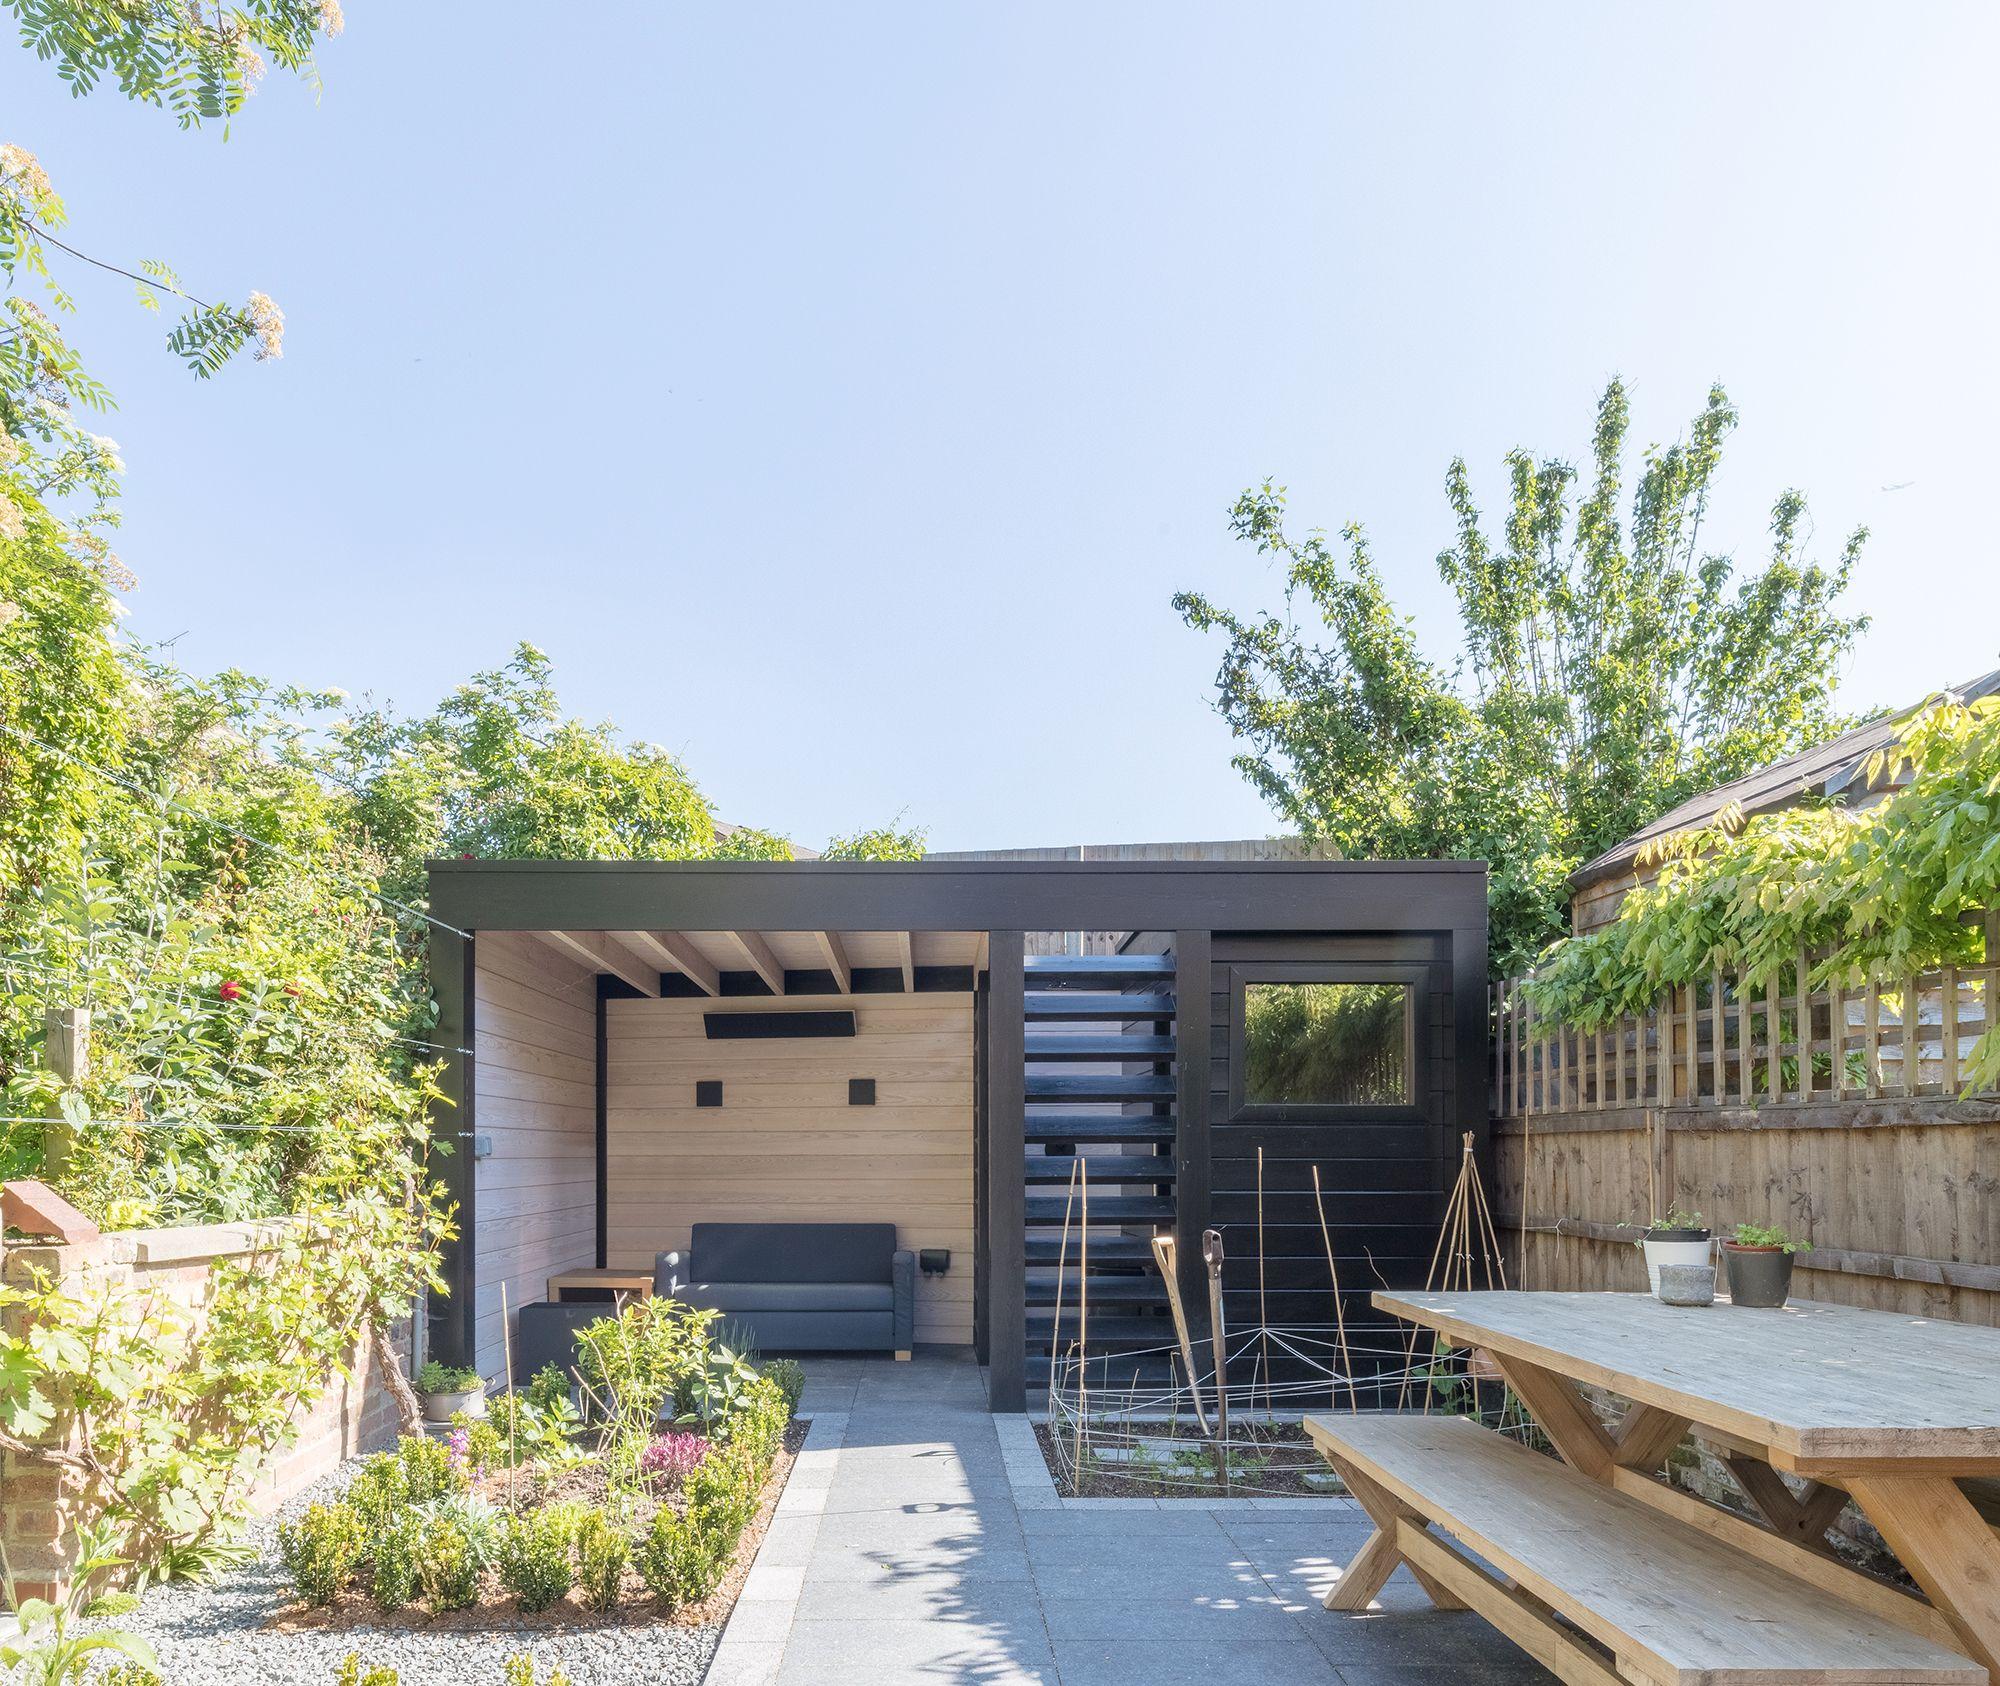 29 small backyard ideas simple